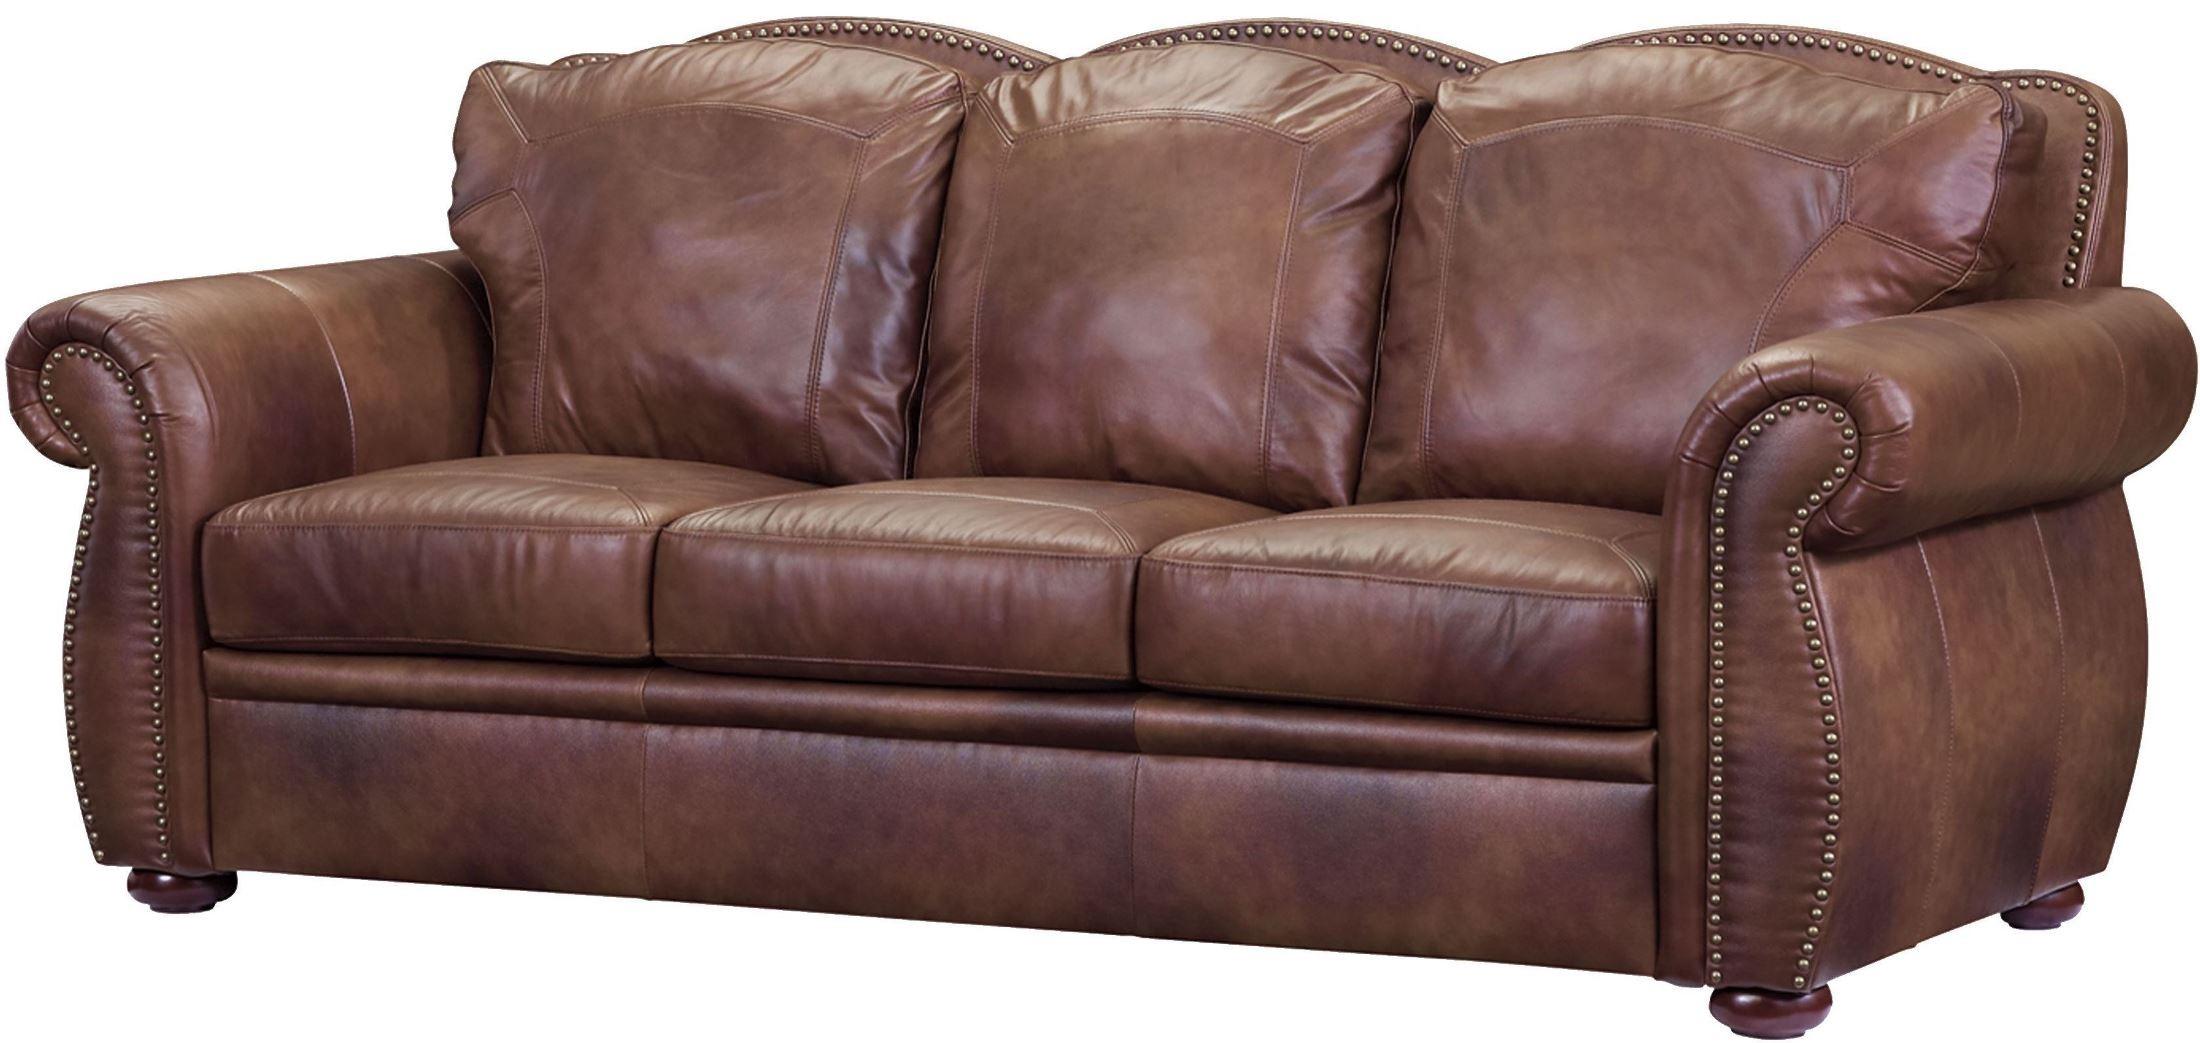 leather italia sofa furniture linen sofas sydney arizona marco from 1444 6110 0304234